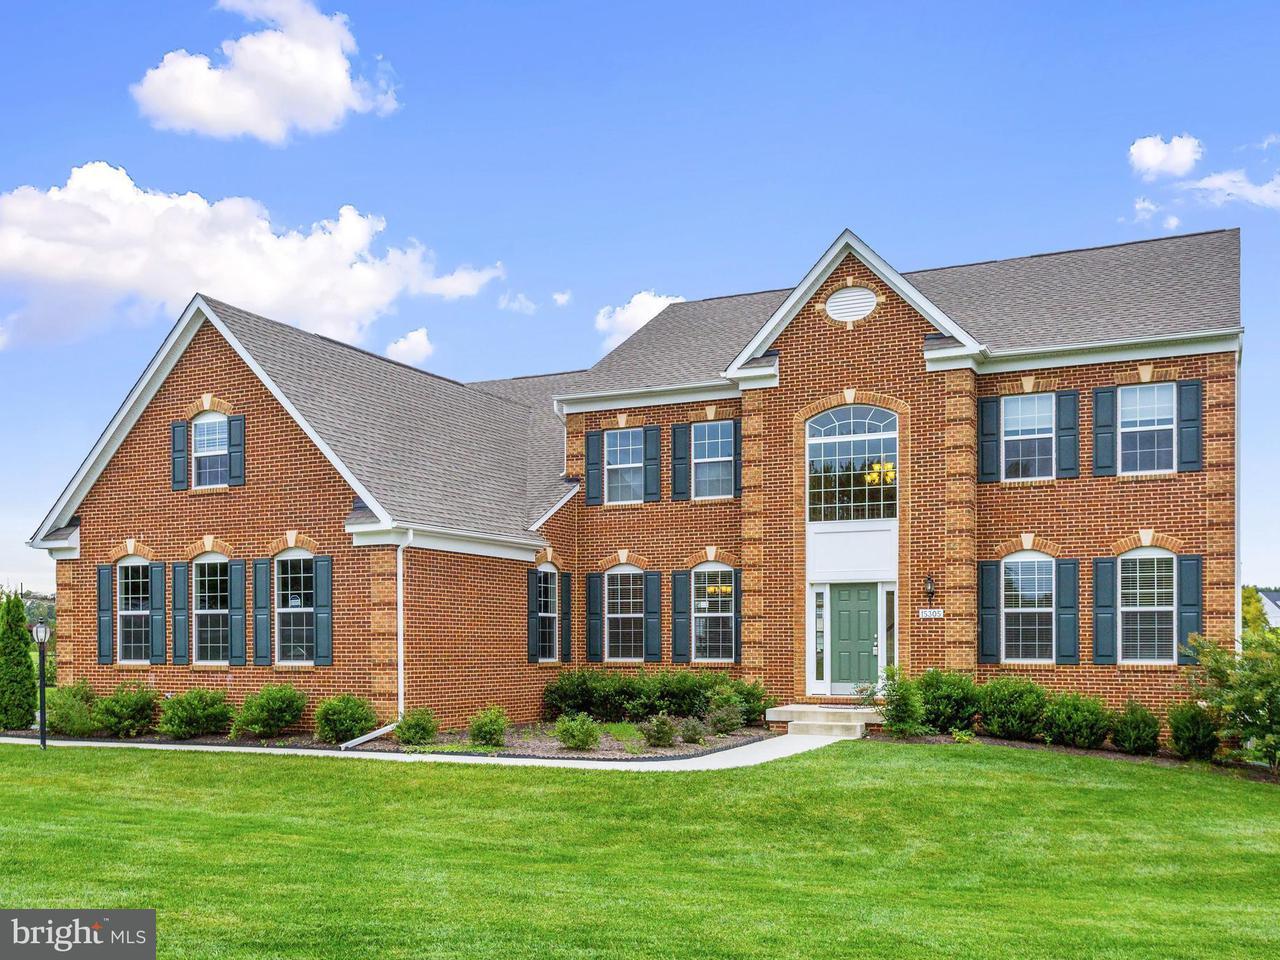 Maison unifamiliale pour l Vente à 15305 SWEETBAY Street 15305 SWEETBAY Street Woodbine, Maryland 21797 États-Unis